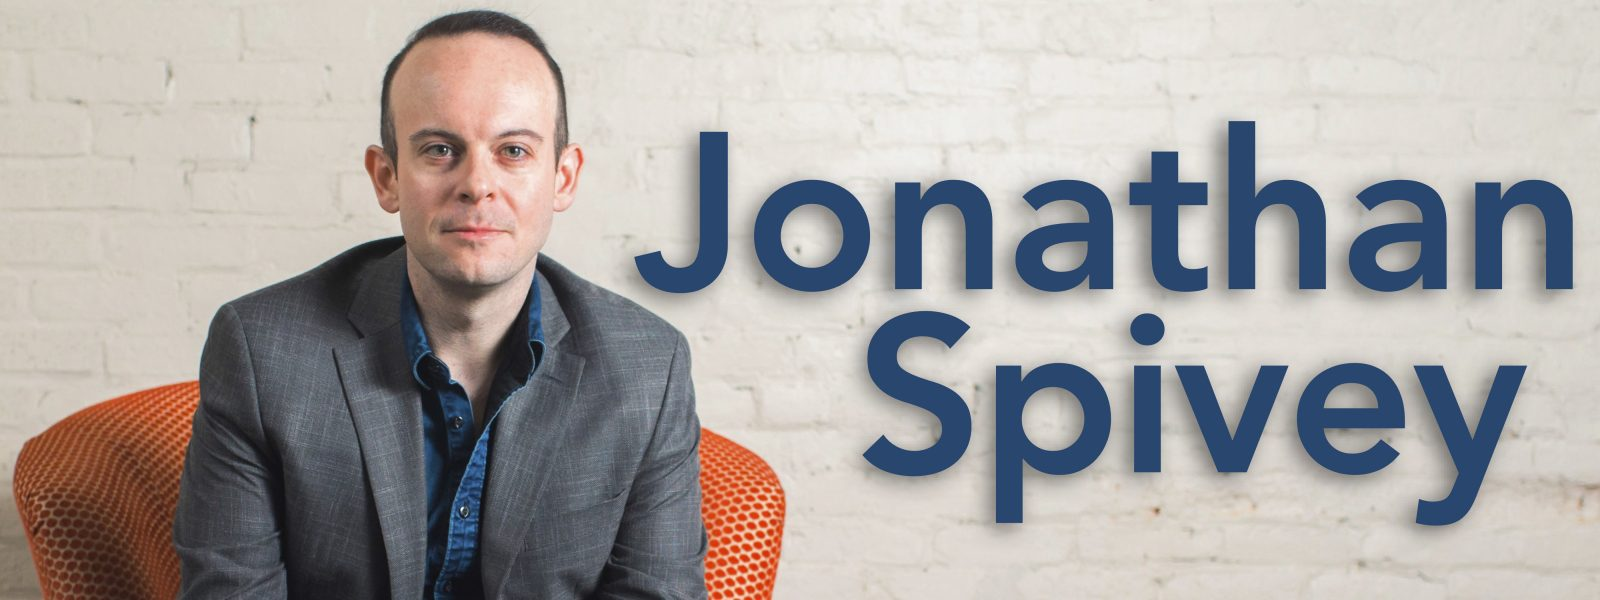 Jonathan Spivey